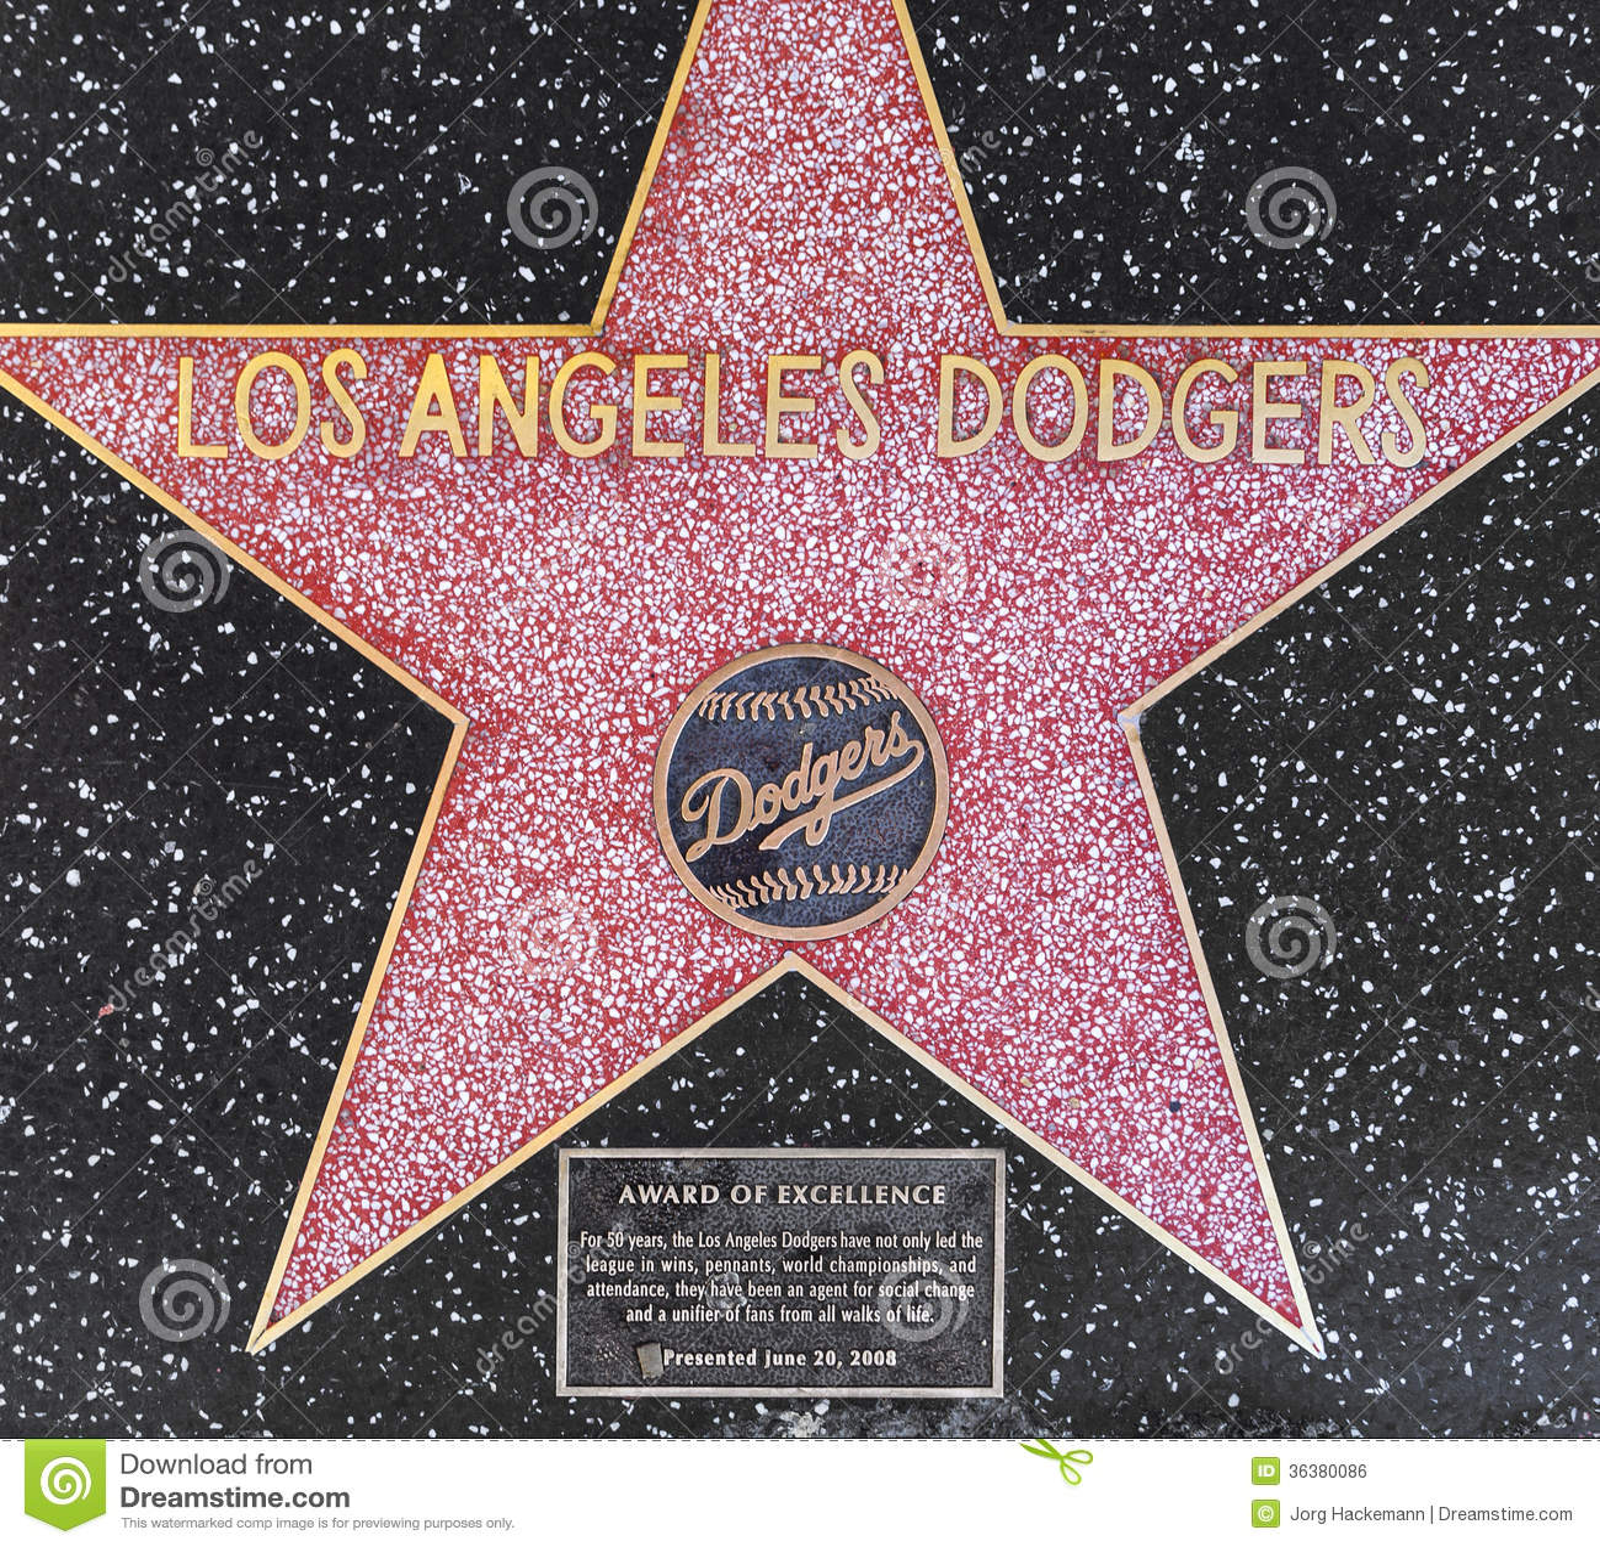 los angeles dodgers 39 star on hollywood walk of fame editorial photo image of stars movie. Black Bedroom Furniture Sets. Home Design Ideas